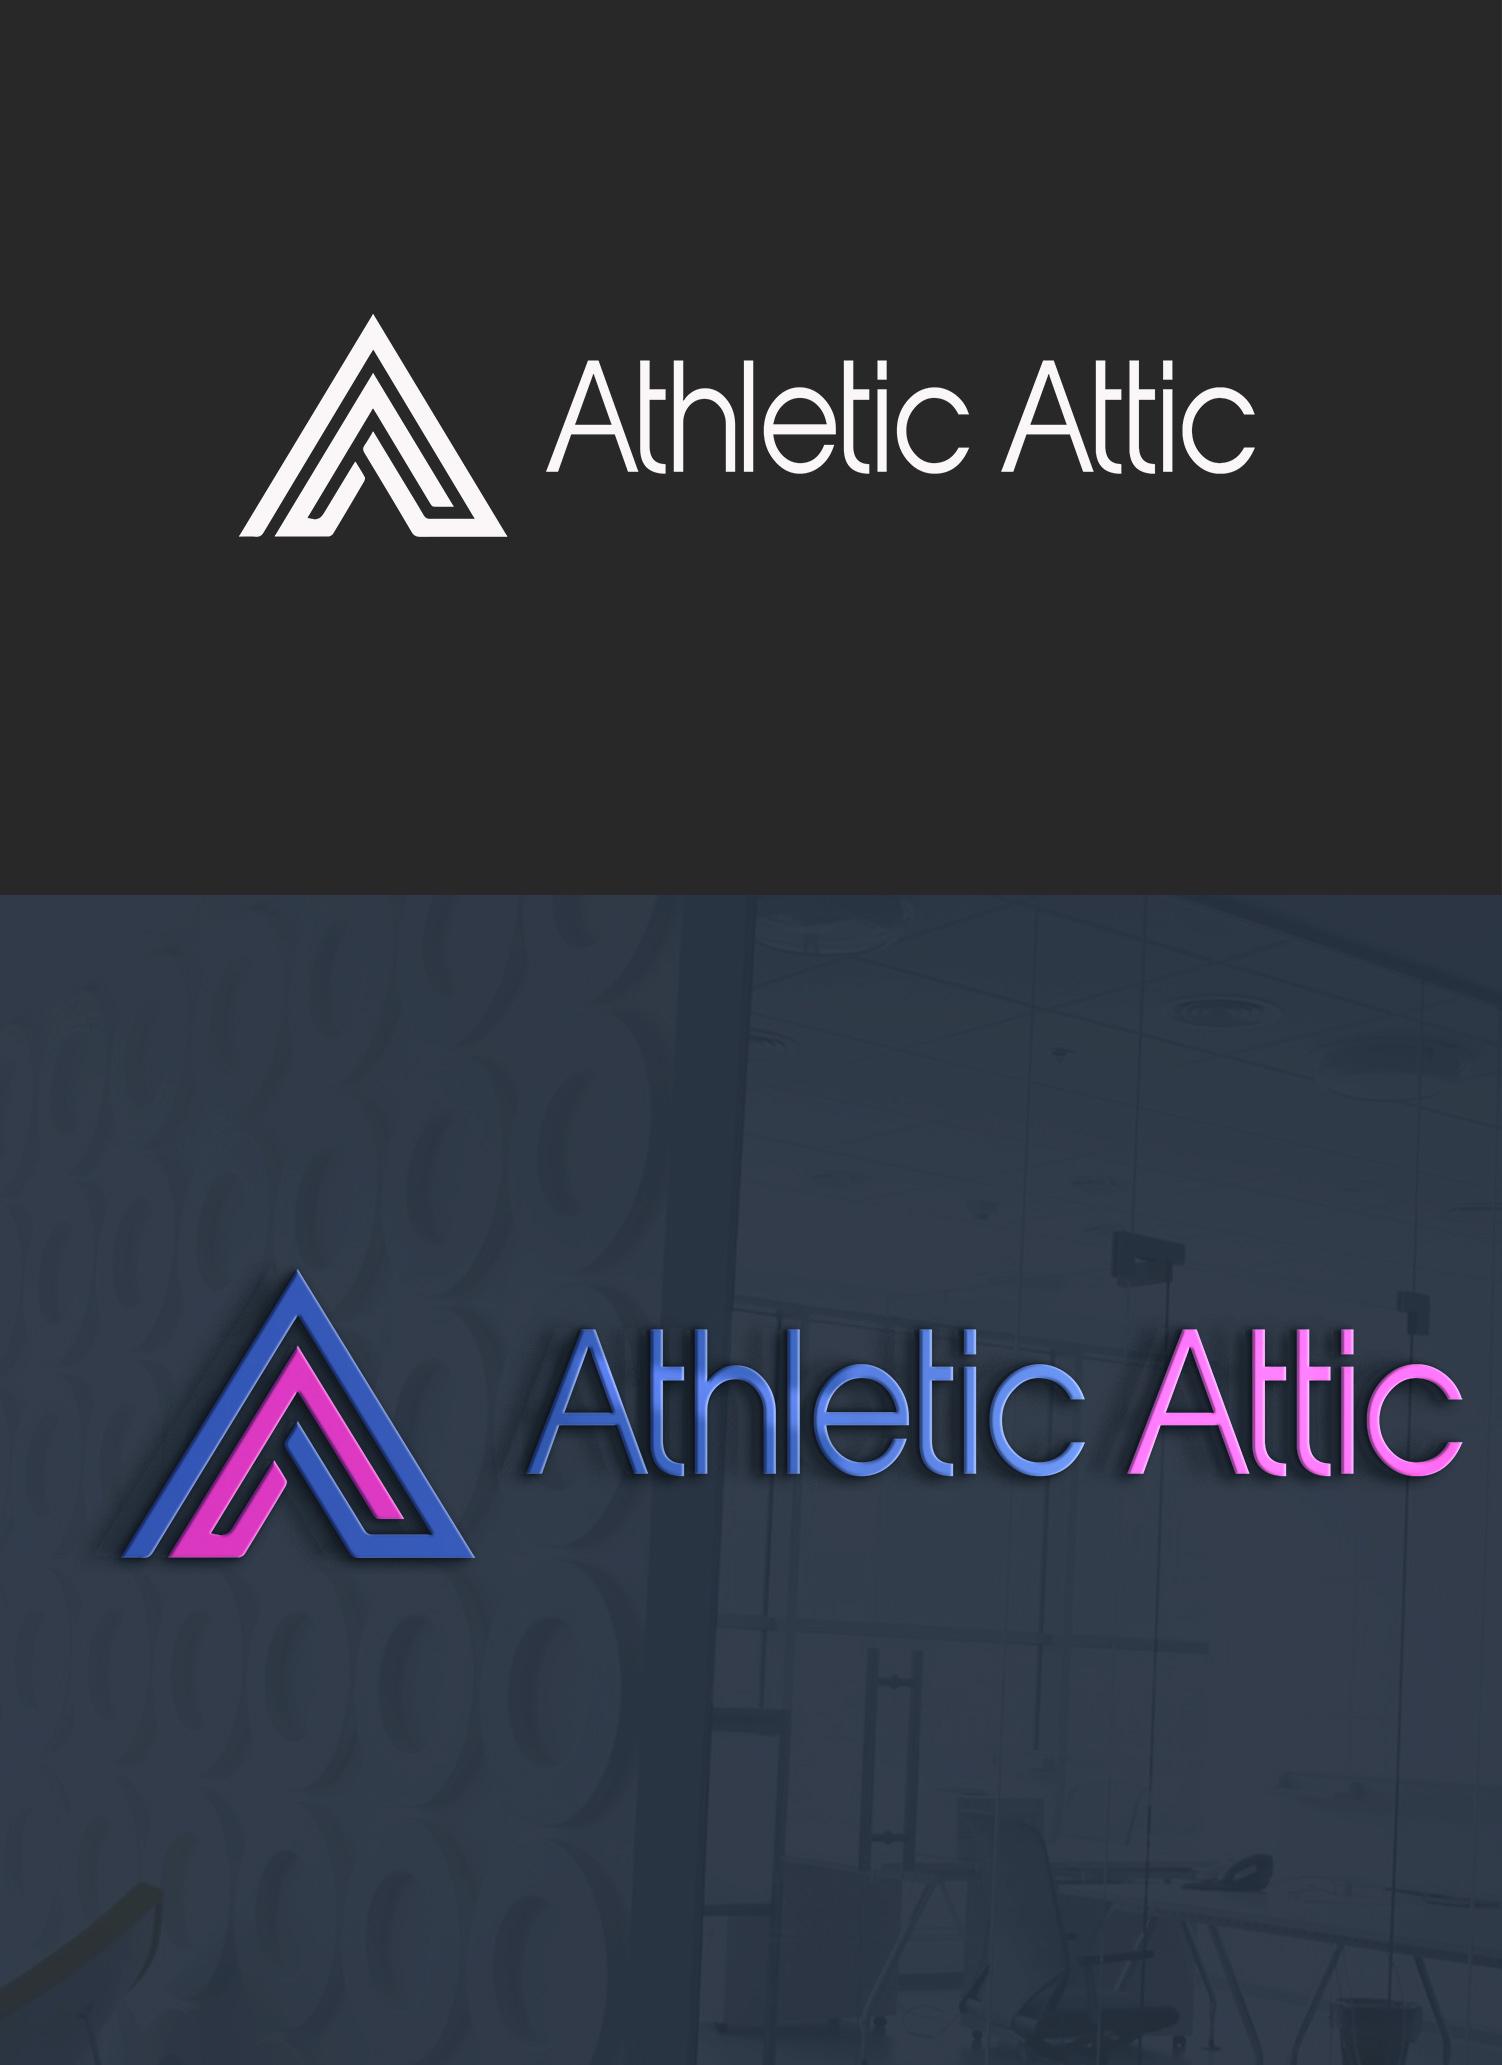 Logo Design by YANUAR ANTABUA - Entry No. 8 in the Logo Design Contest Fun Logo Design for Athletic Attic.